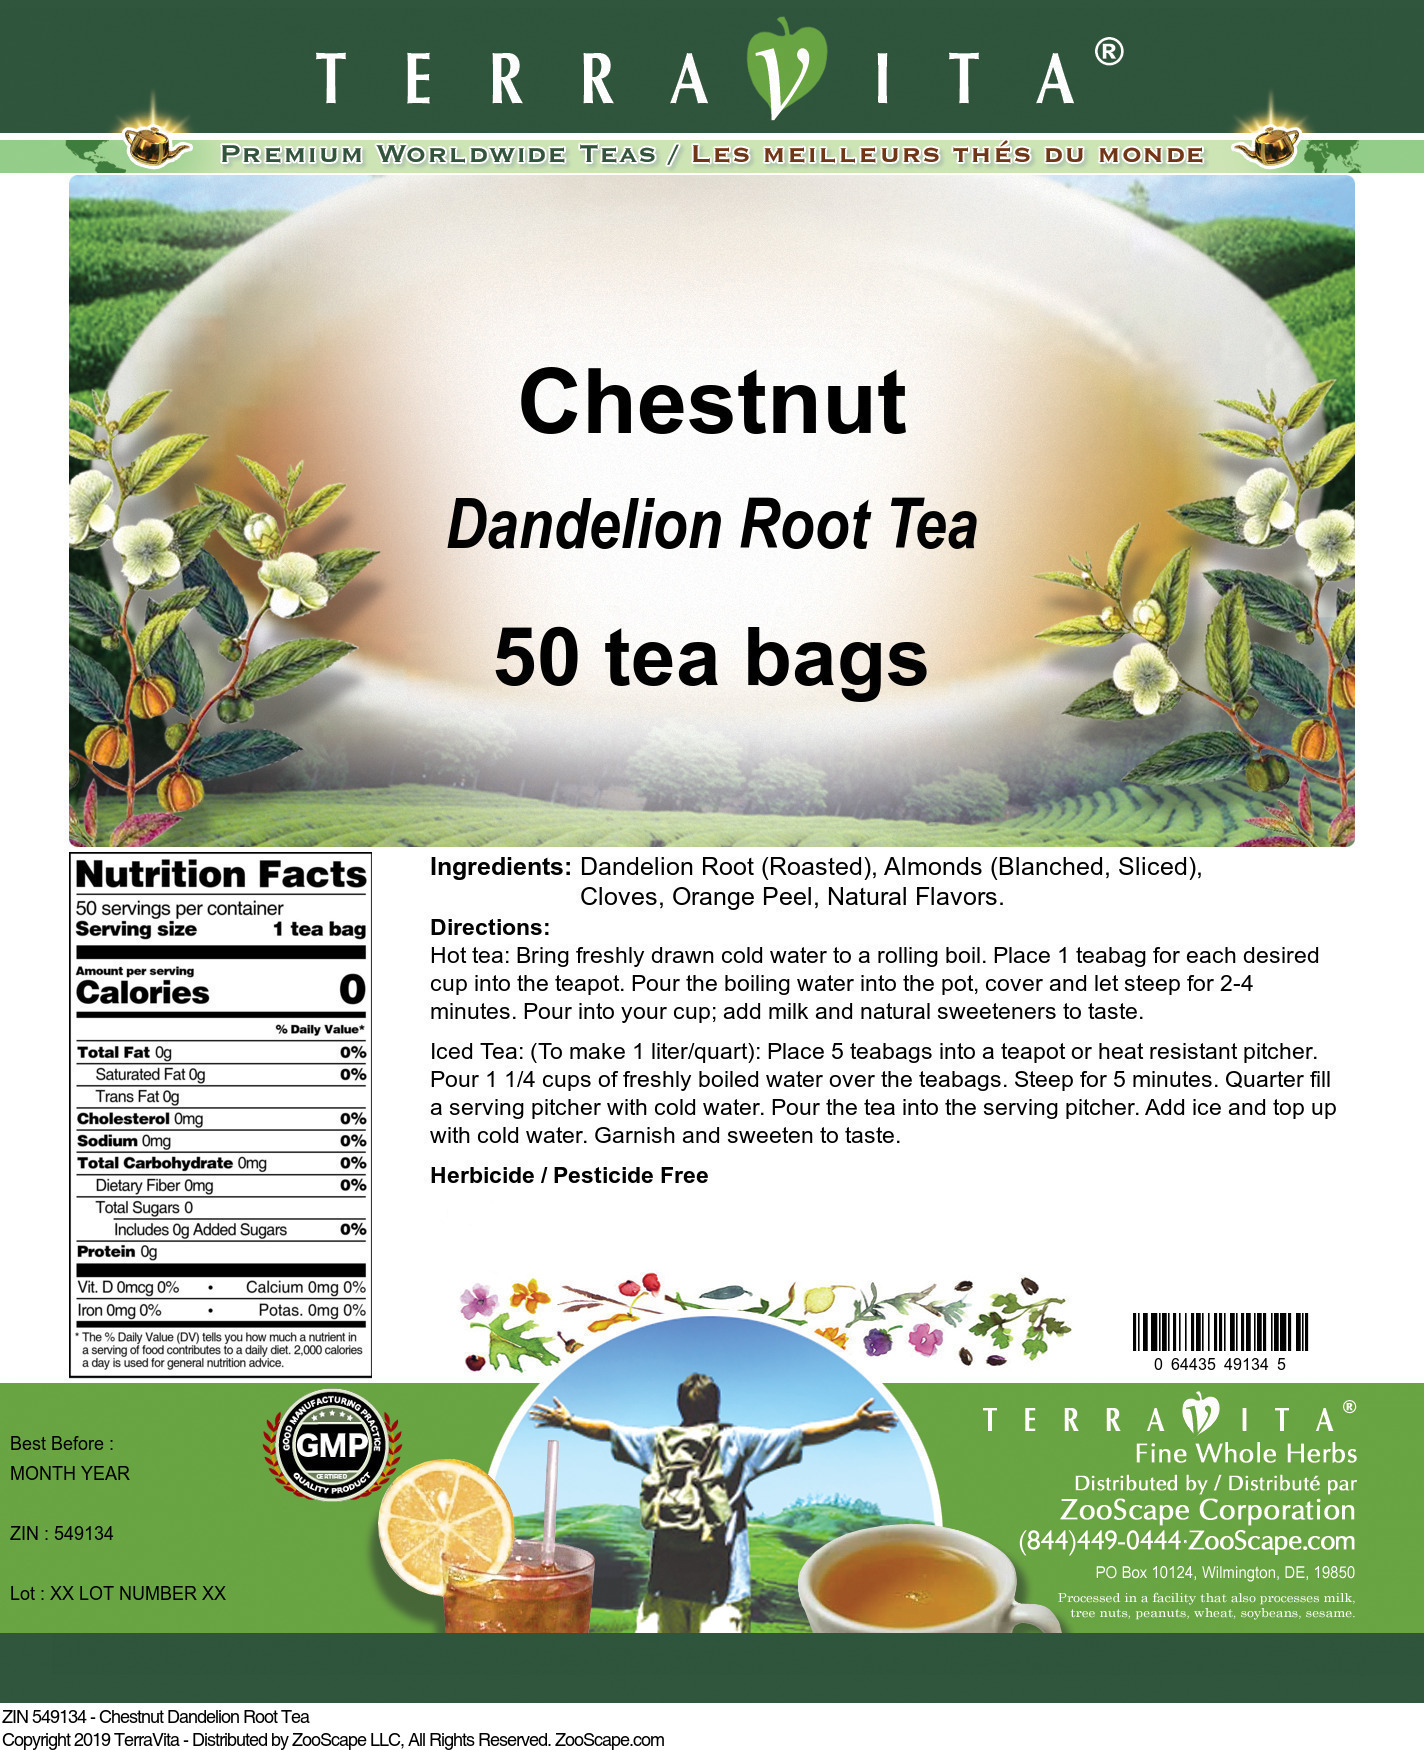 Chestnut Dandelion Root